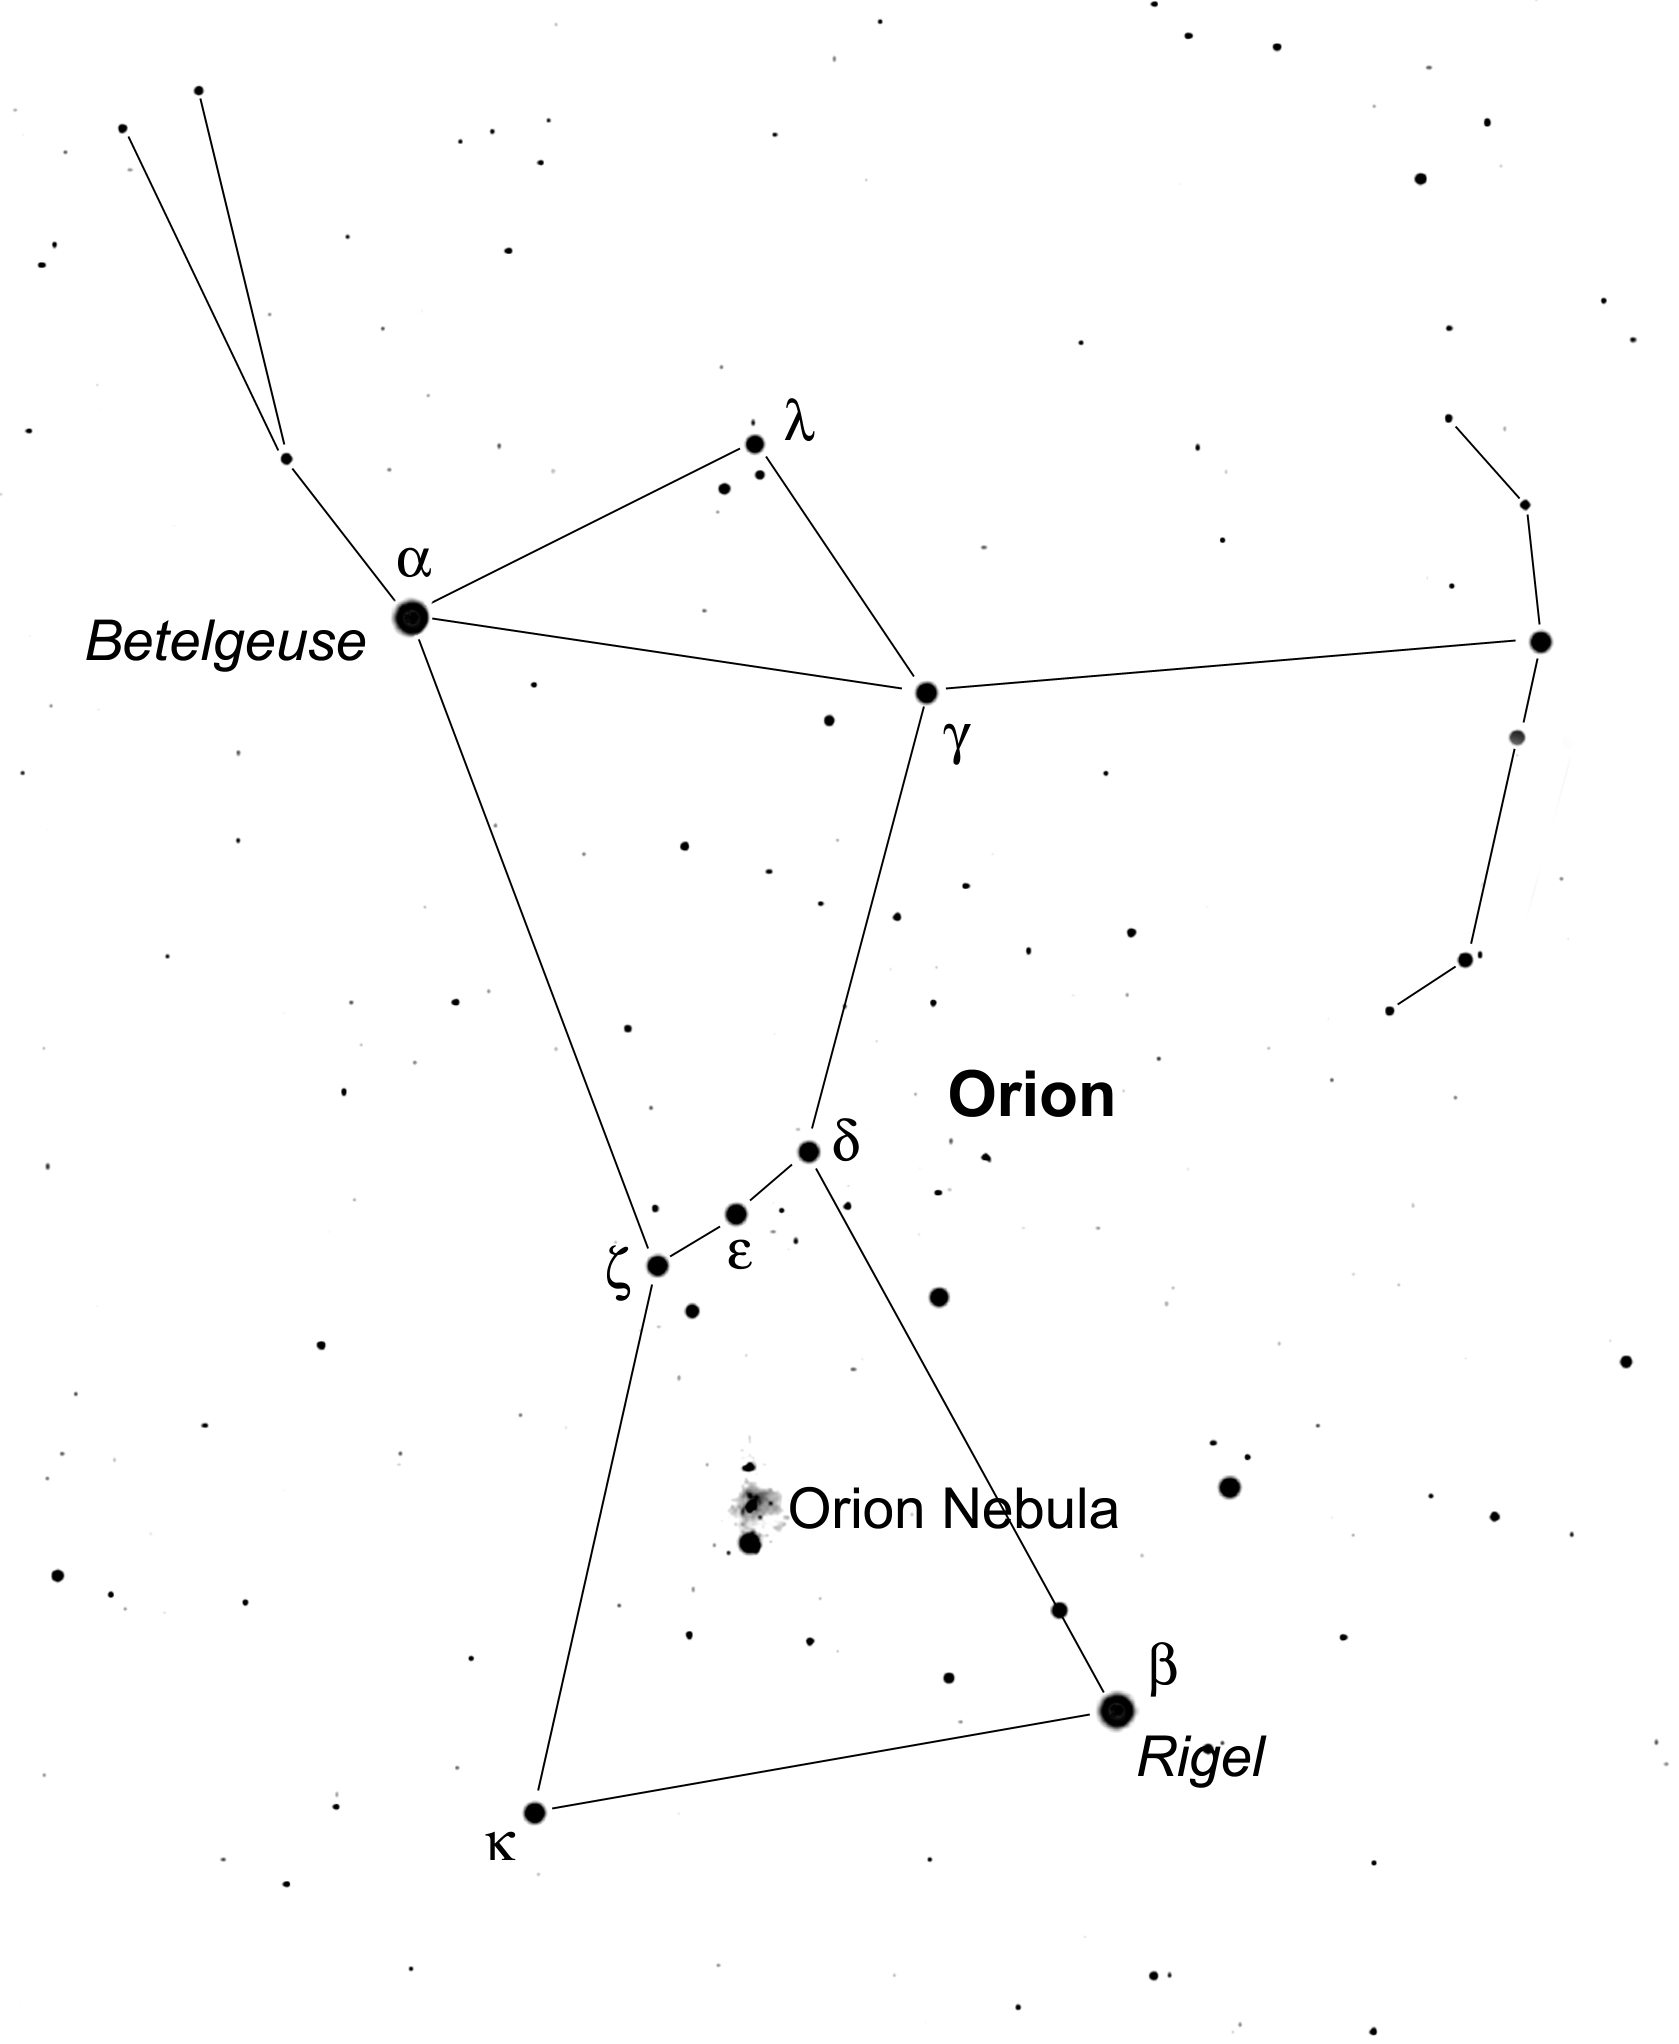 Nevada's night sky: Orion the Hunter